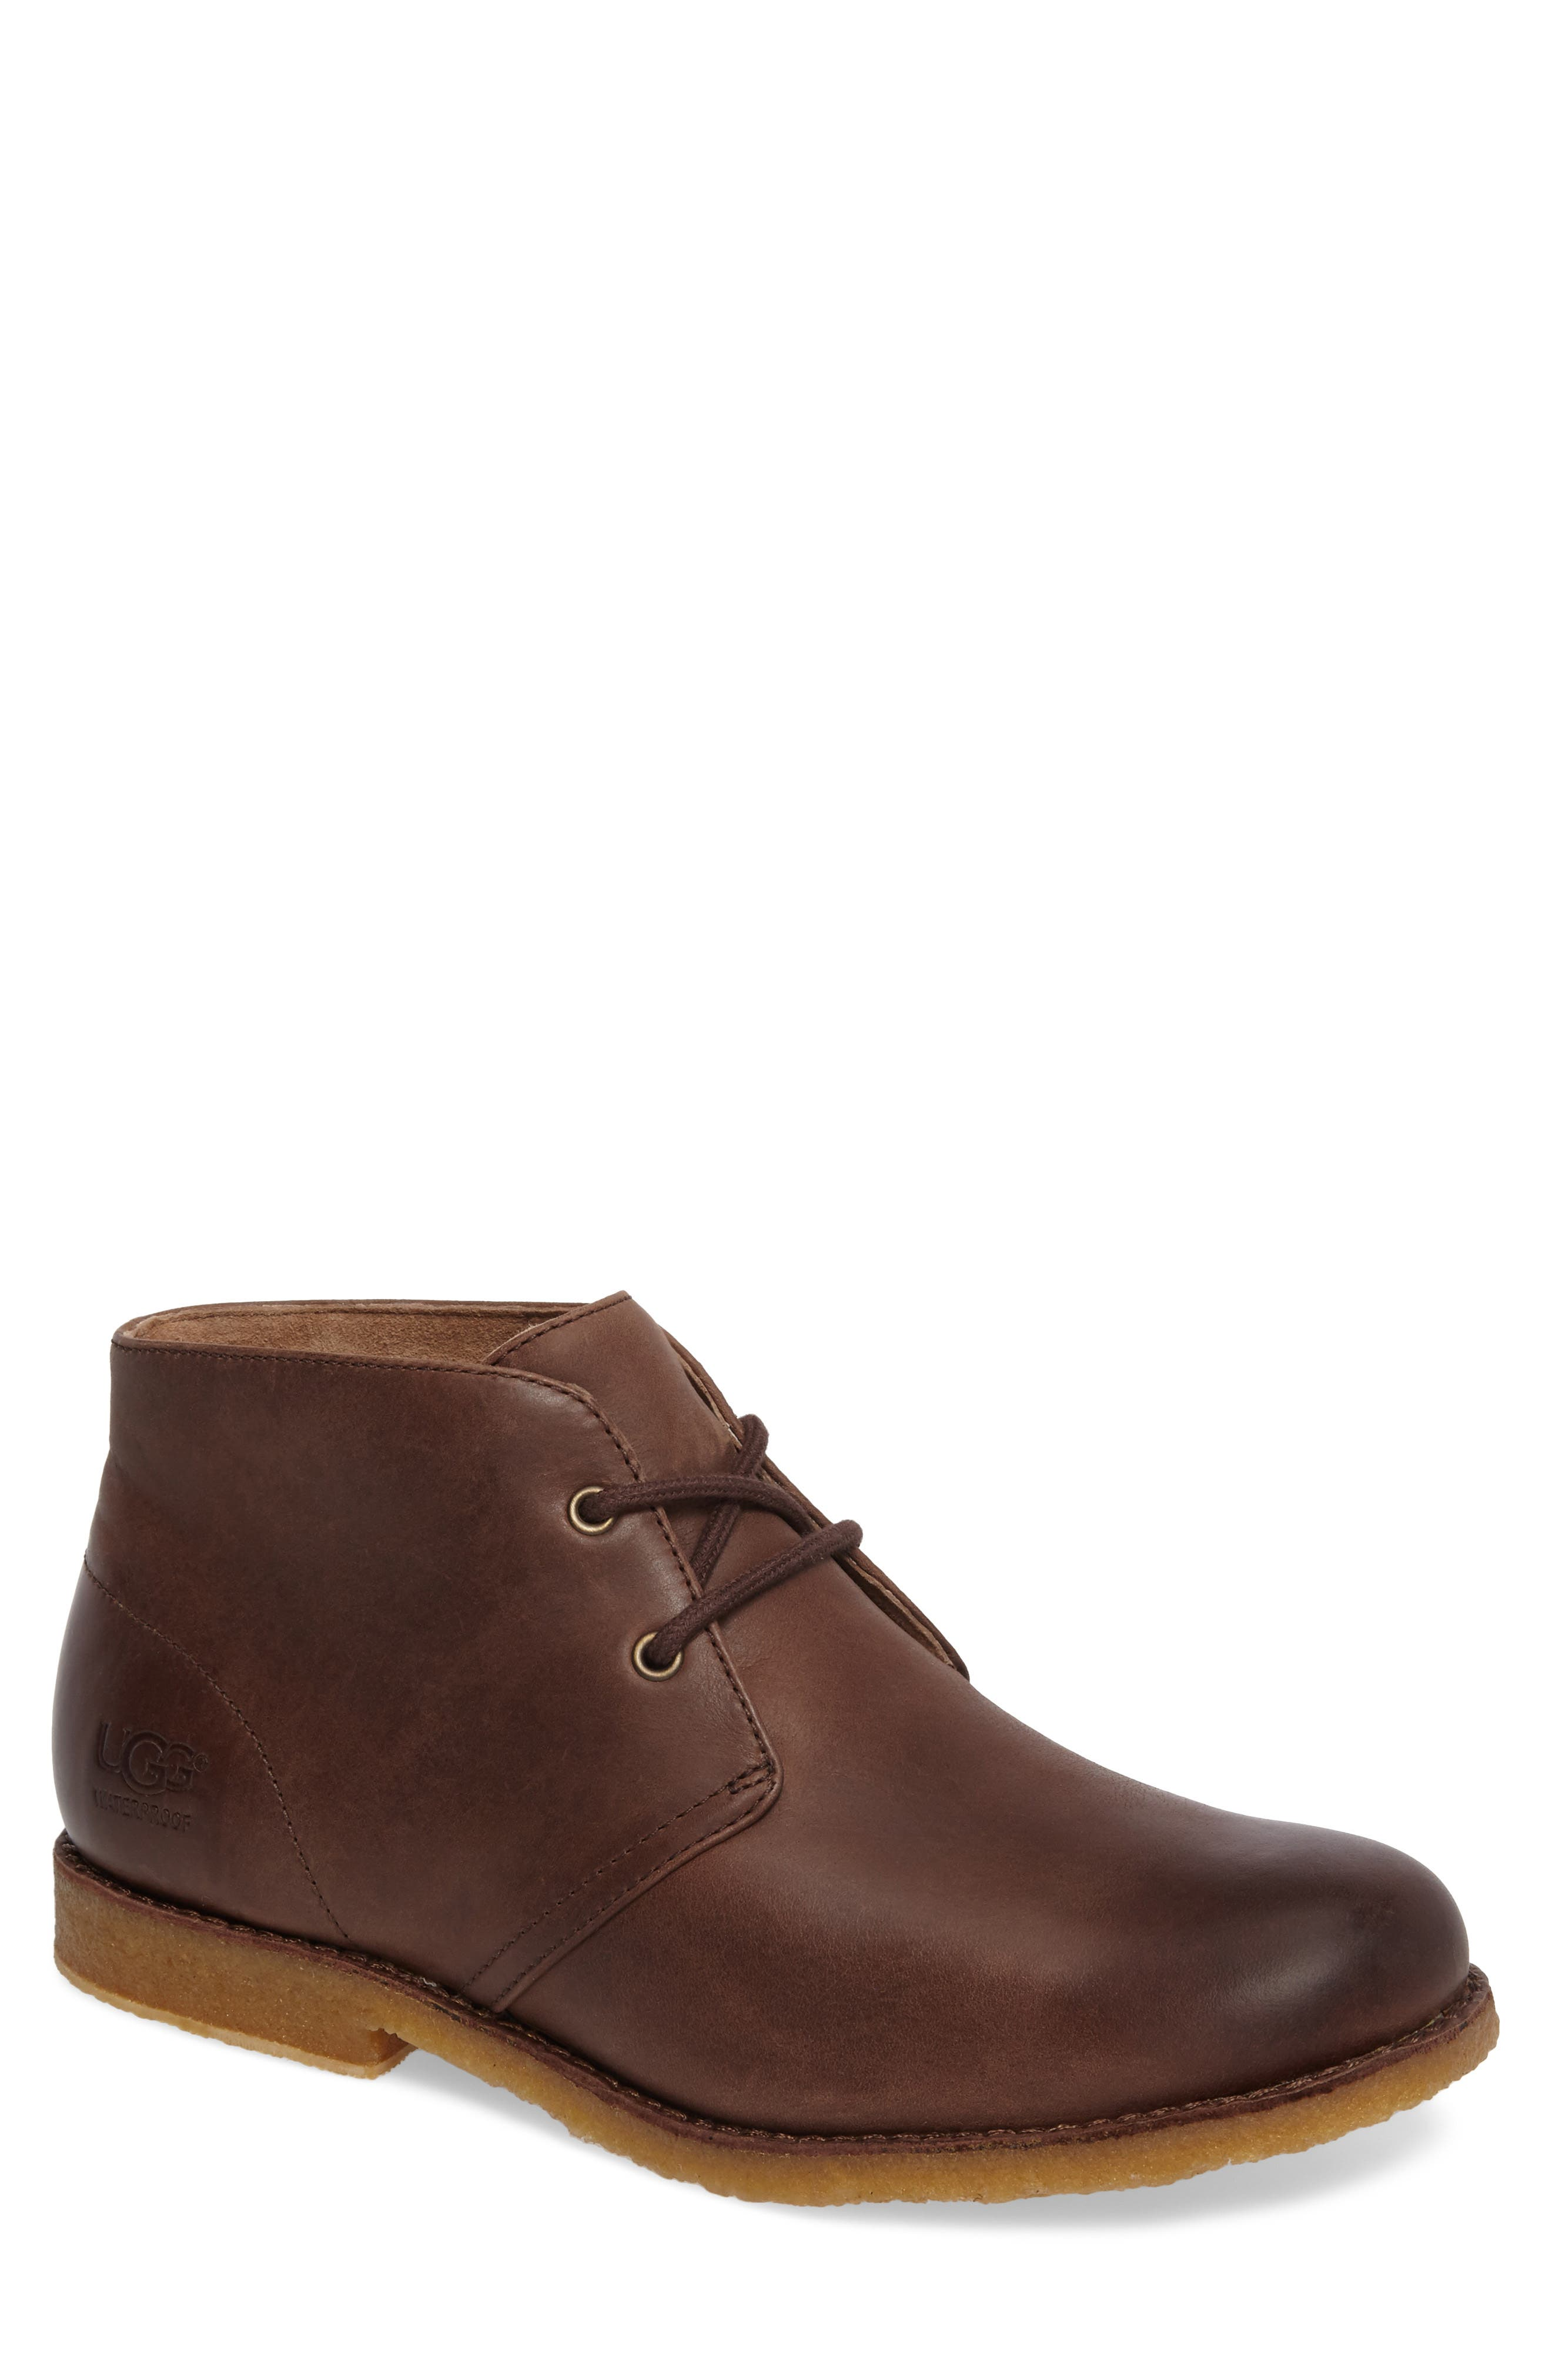 Alternate Image 1 Selected - UGG® Leighton Chukka Boot (Men)